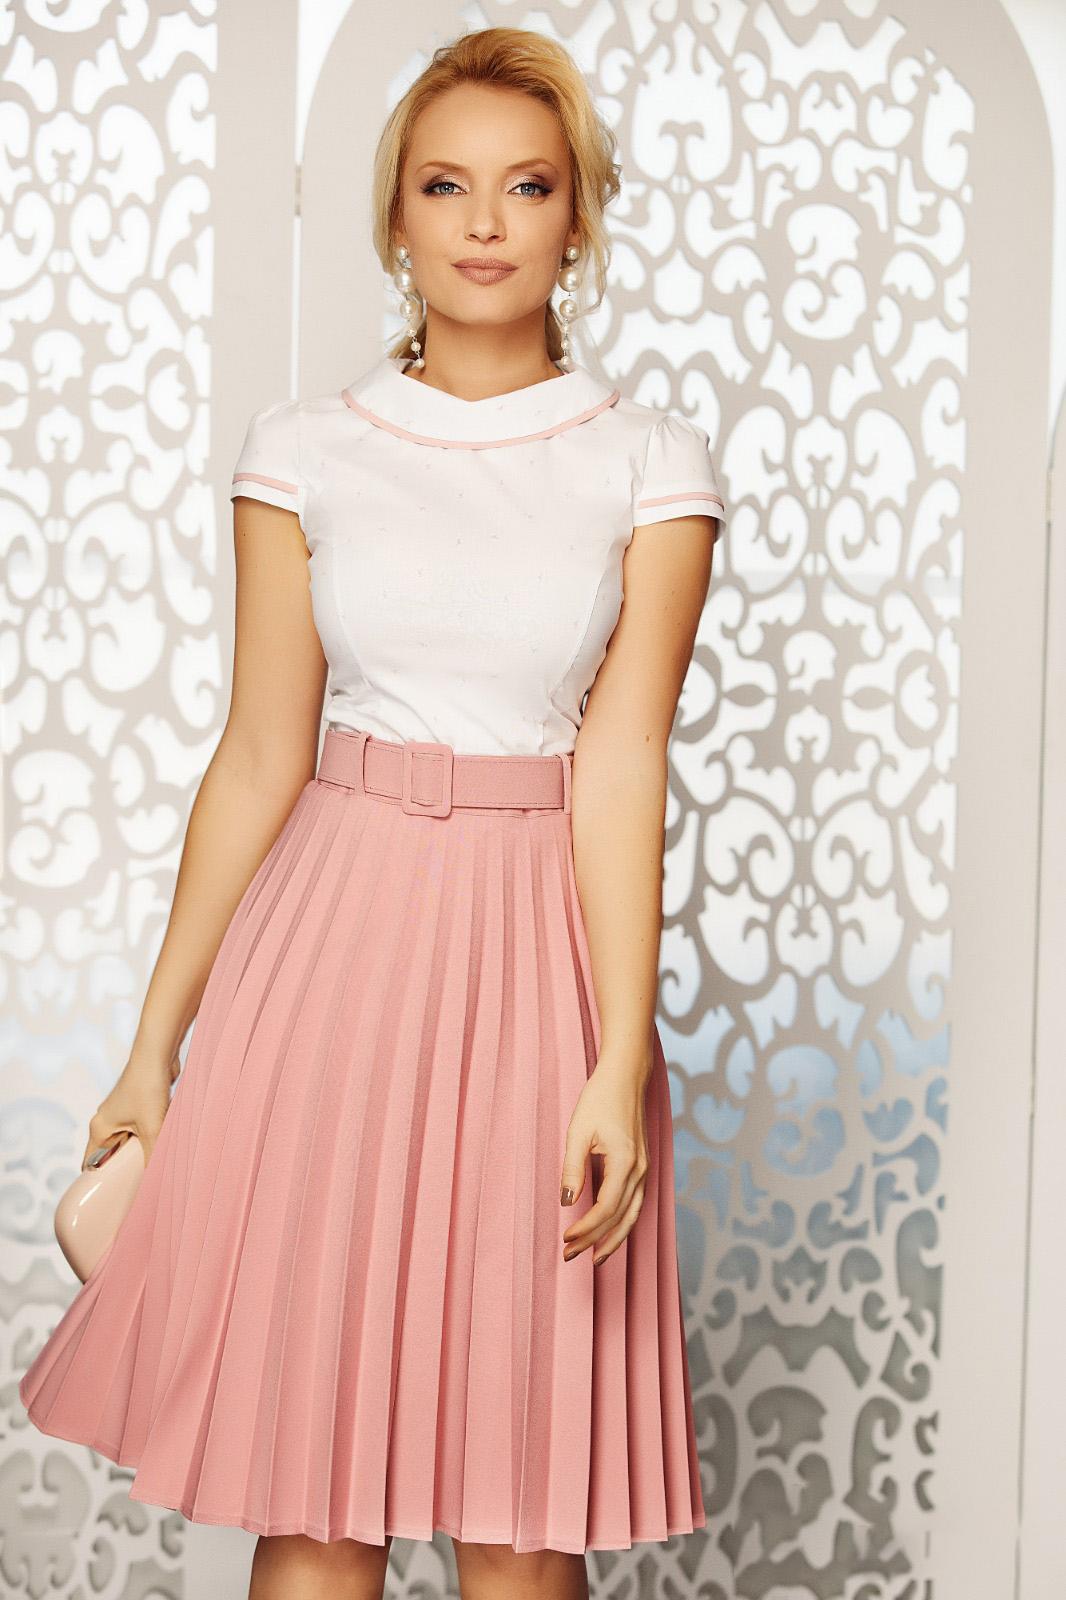 Fusta Fofy rosa eleganta plisata in clos cu talie inalta din stofa subtire usor elastica cu accesoriu tip curea